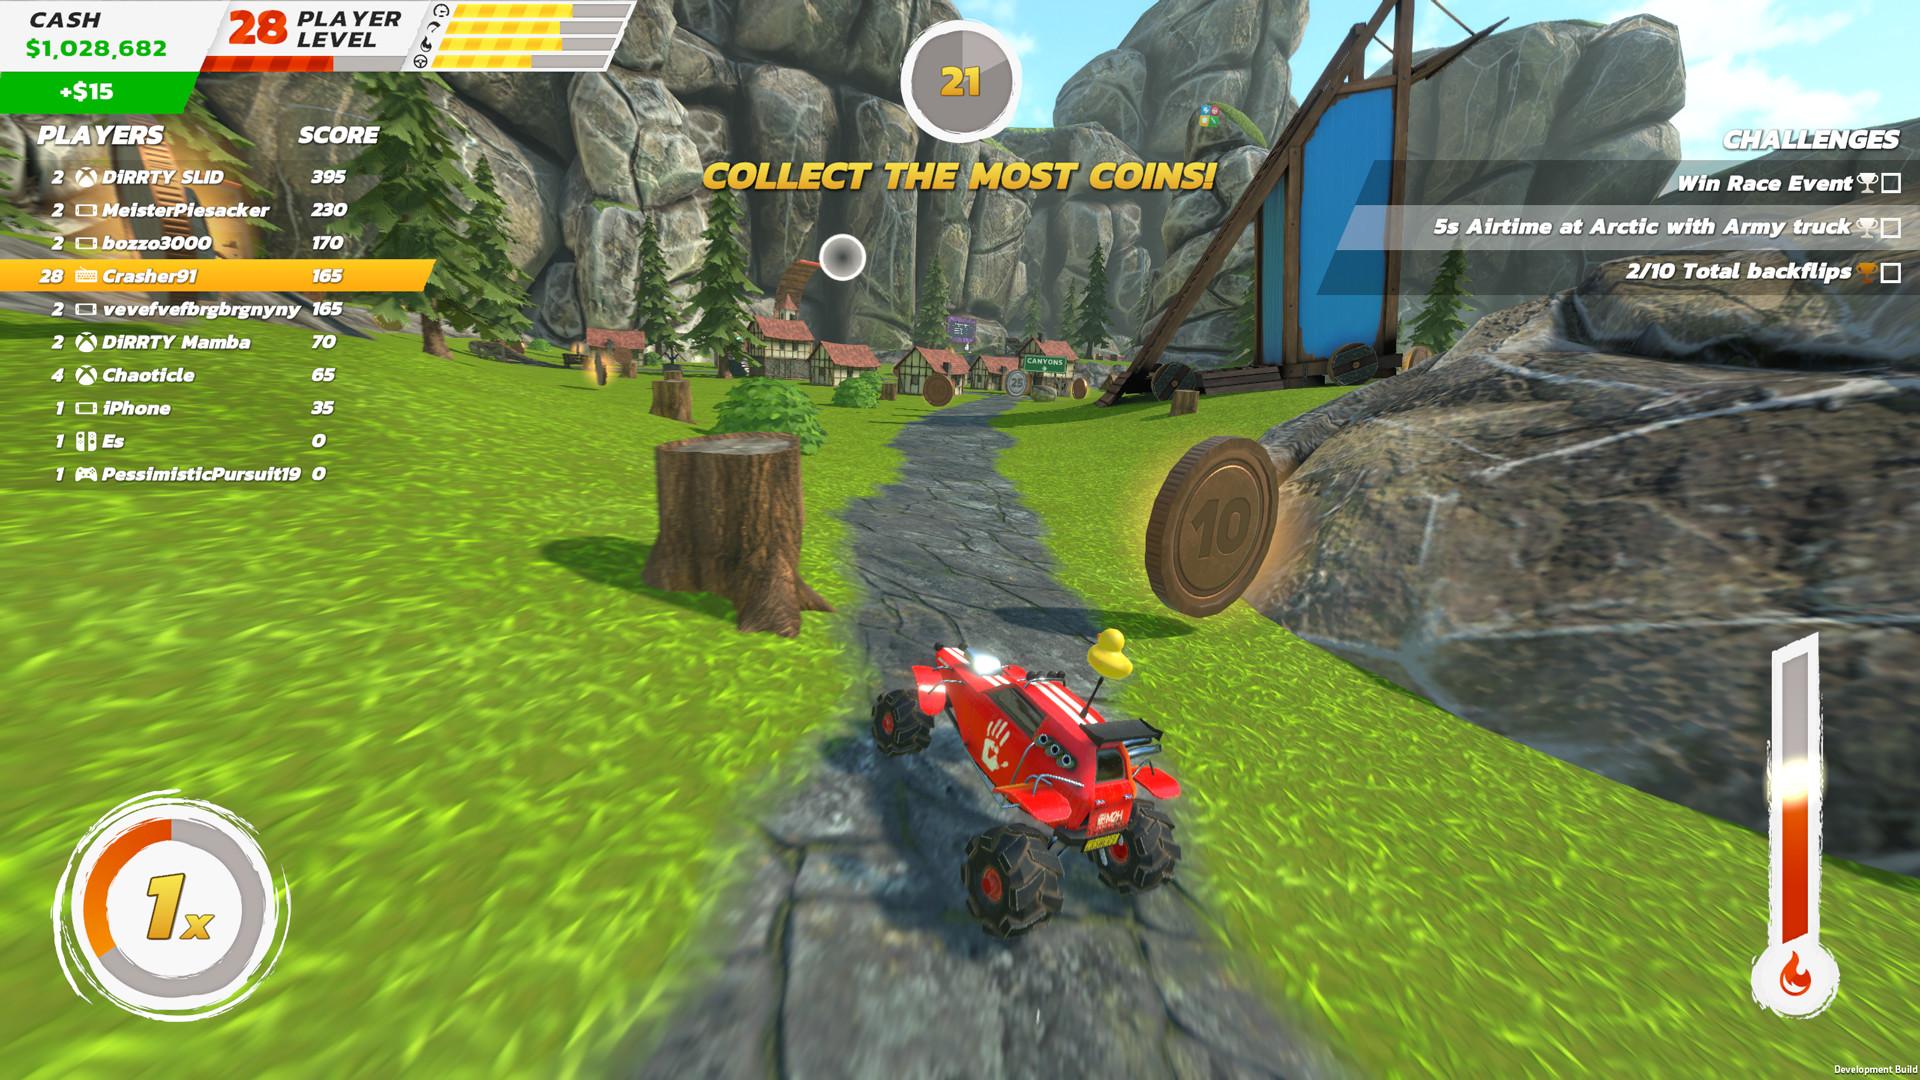 crash-drive-3-pc-screenshot-1